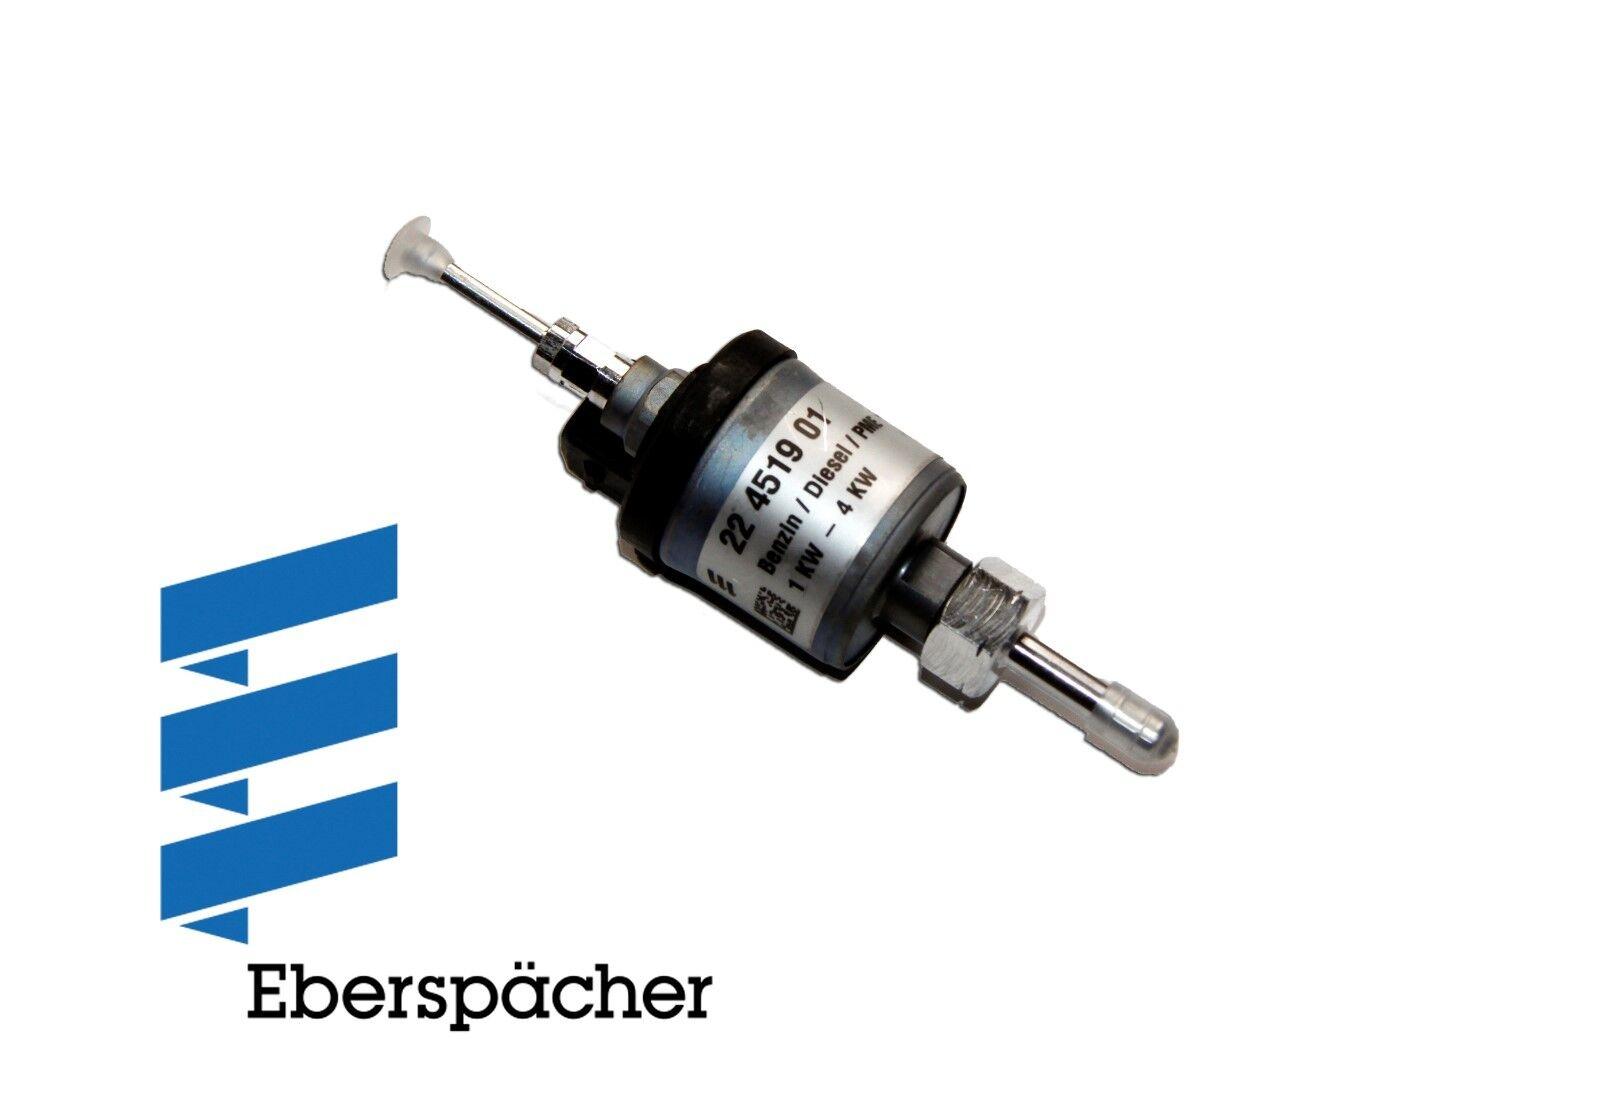 EBERSPACHER EBERSPACHER EBERSPACHER Kraftstoffpumpe Airtronic D2 D4 12V für Diesel Nacht Heizung 3d0ef6